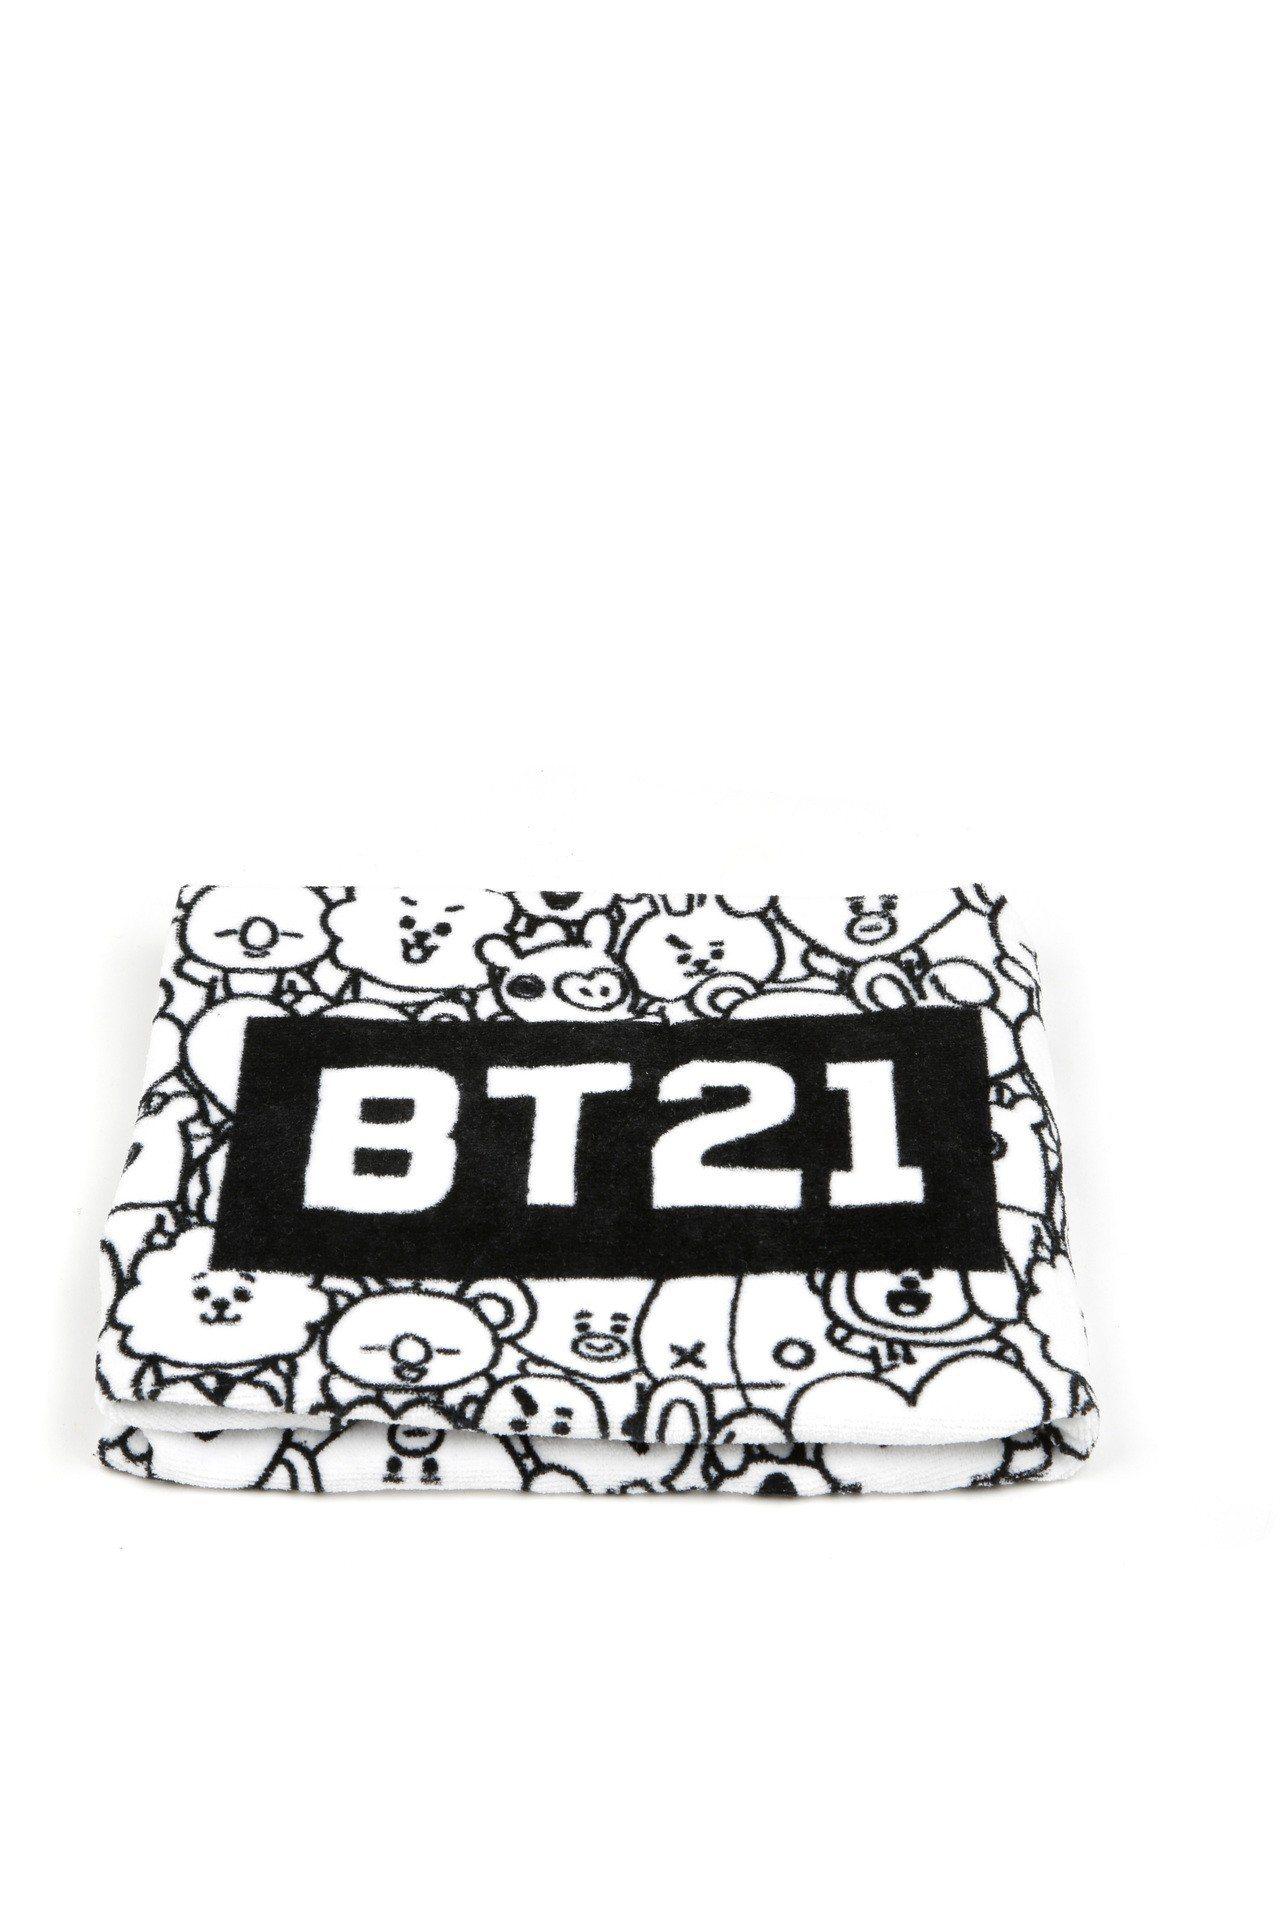 BT21與:CHOCOOLATE聯名系列海灘巾,999元。圖/I.T提供